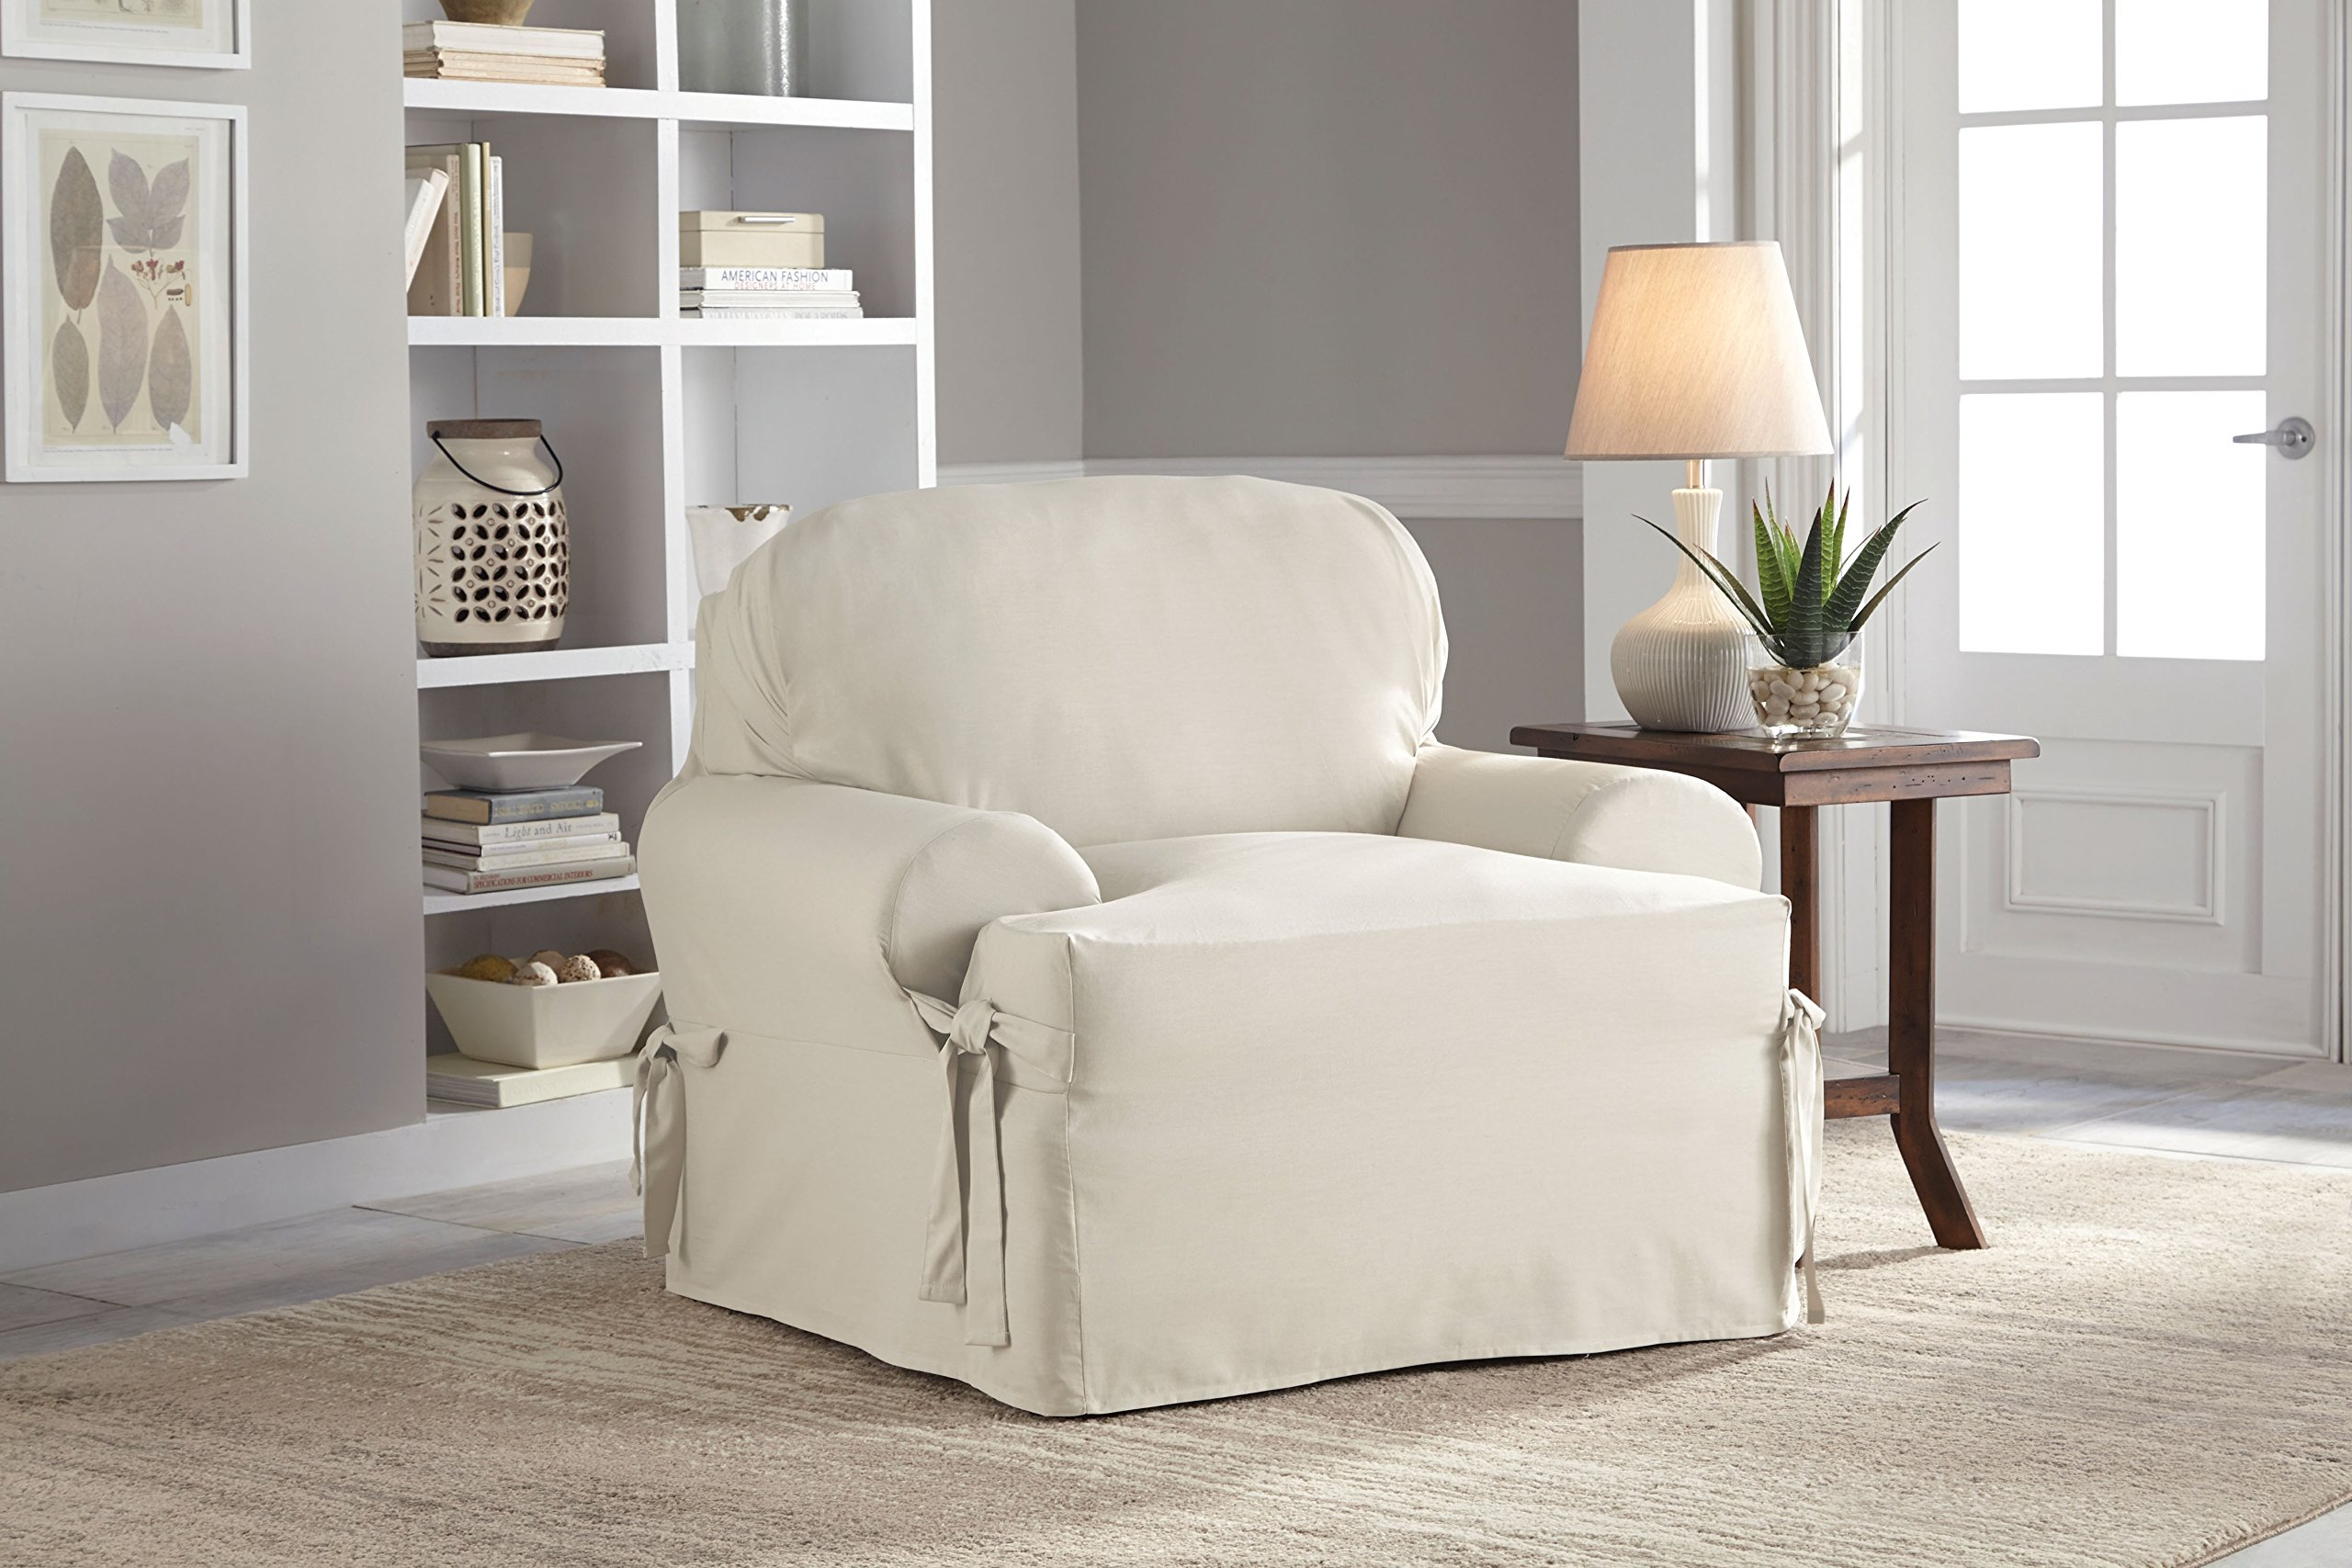 Chair Slip Cover Pattern Design Patterns